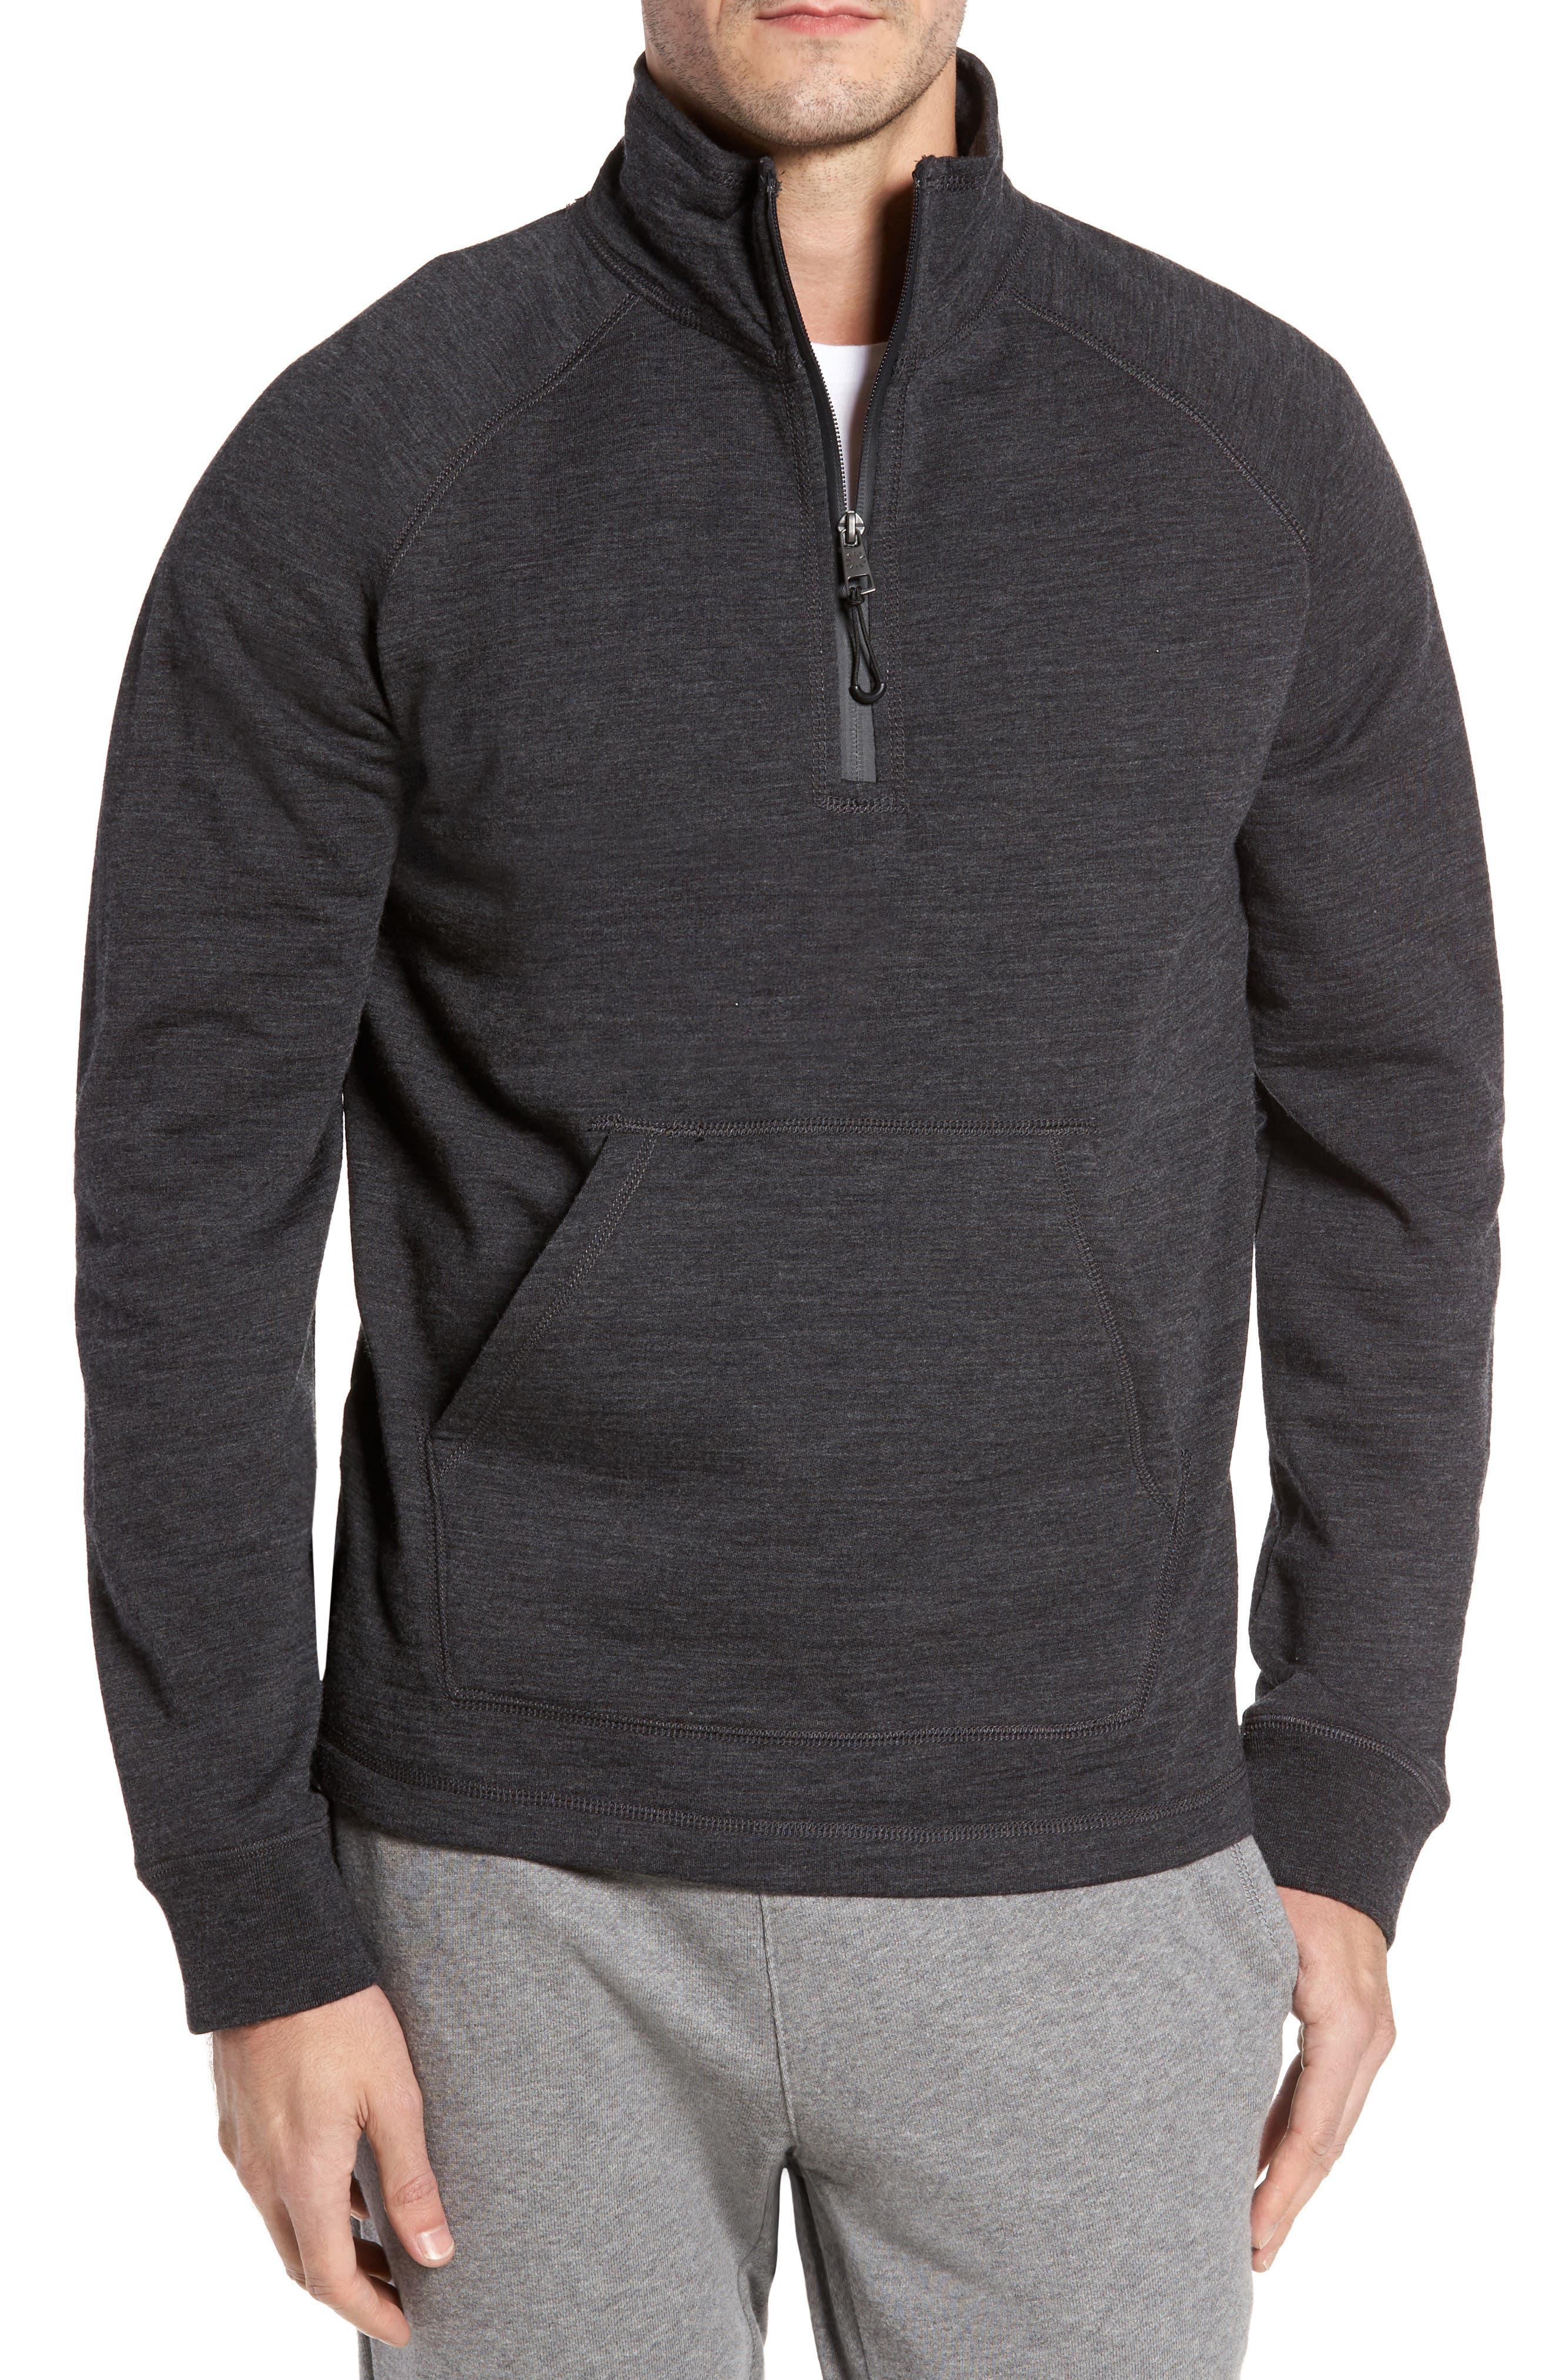 UGG® Merino Wool Quarter Zip Pullover